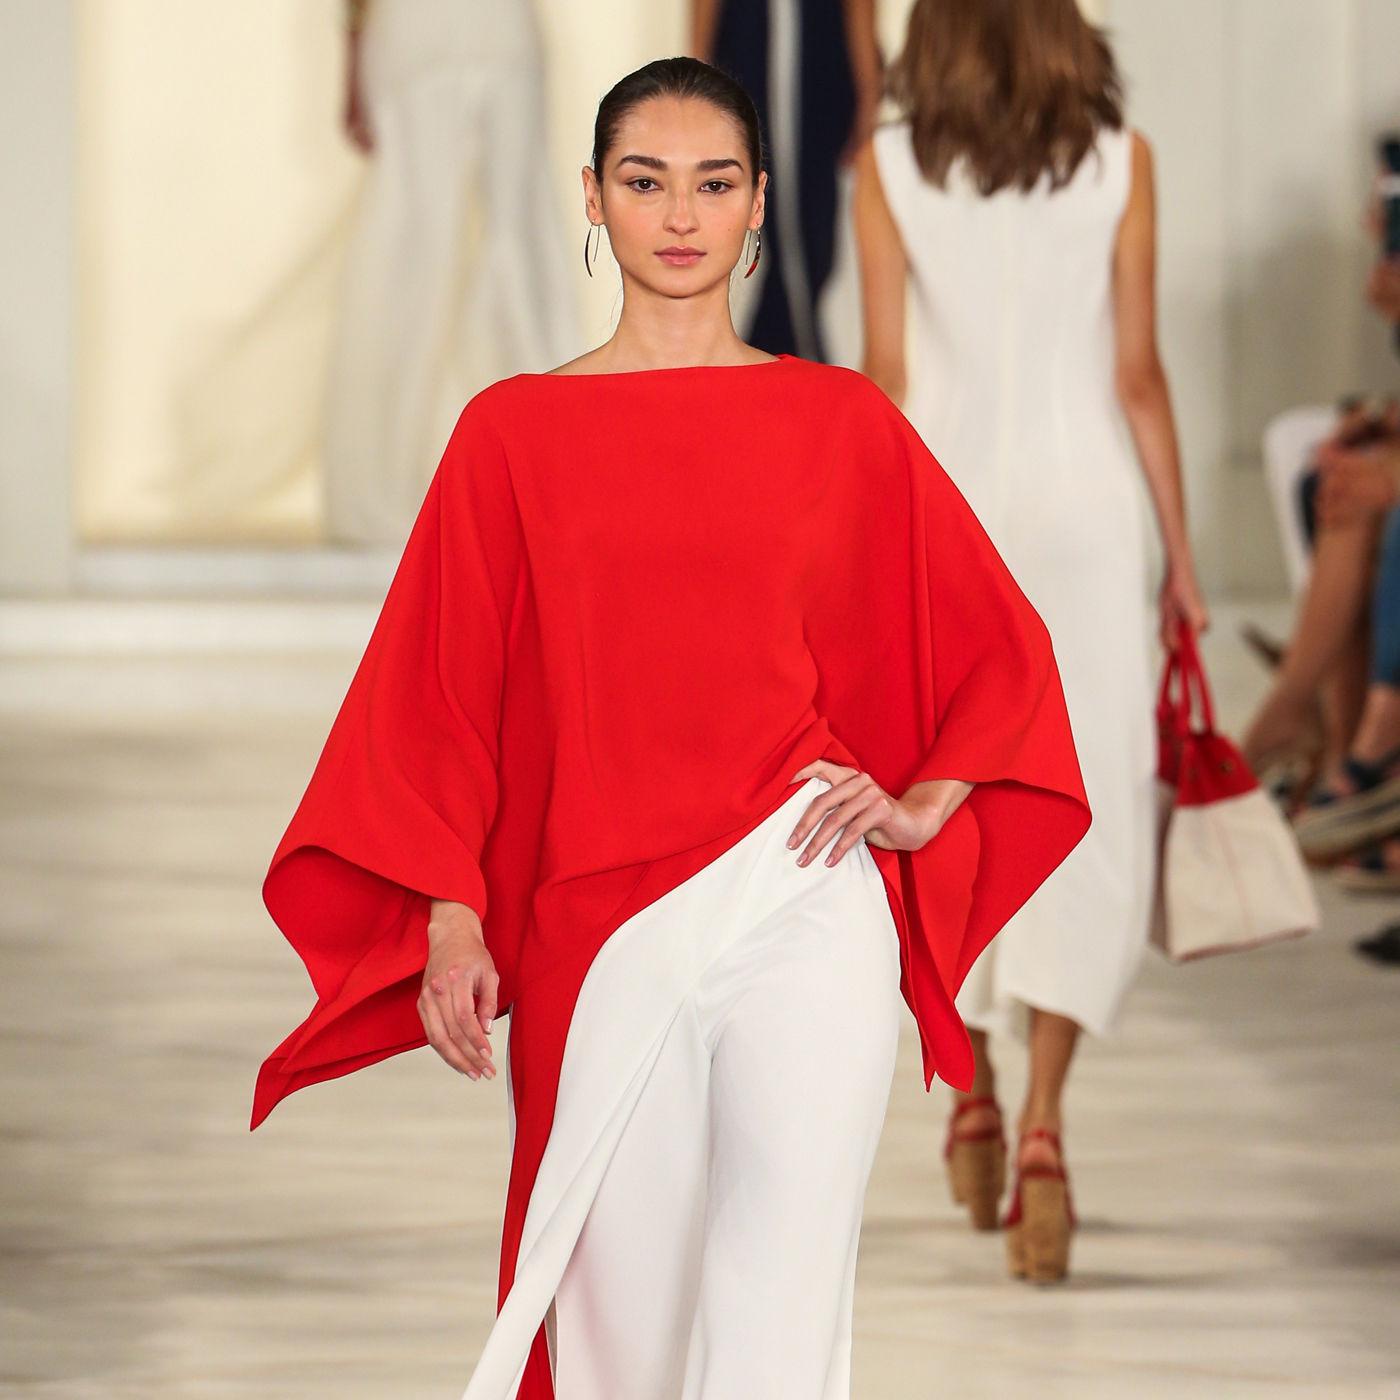 Jis 1016 fashion history ralph lauren qofag6